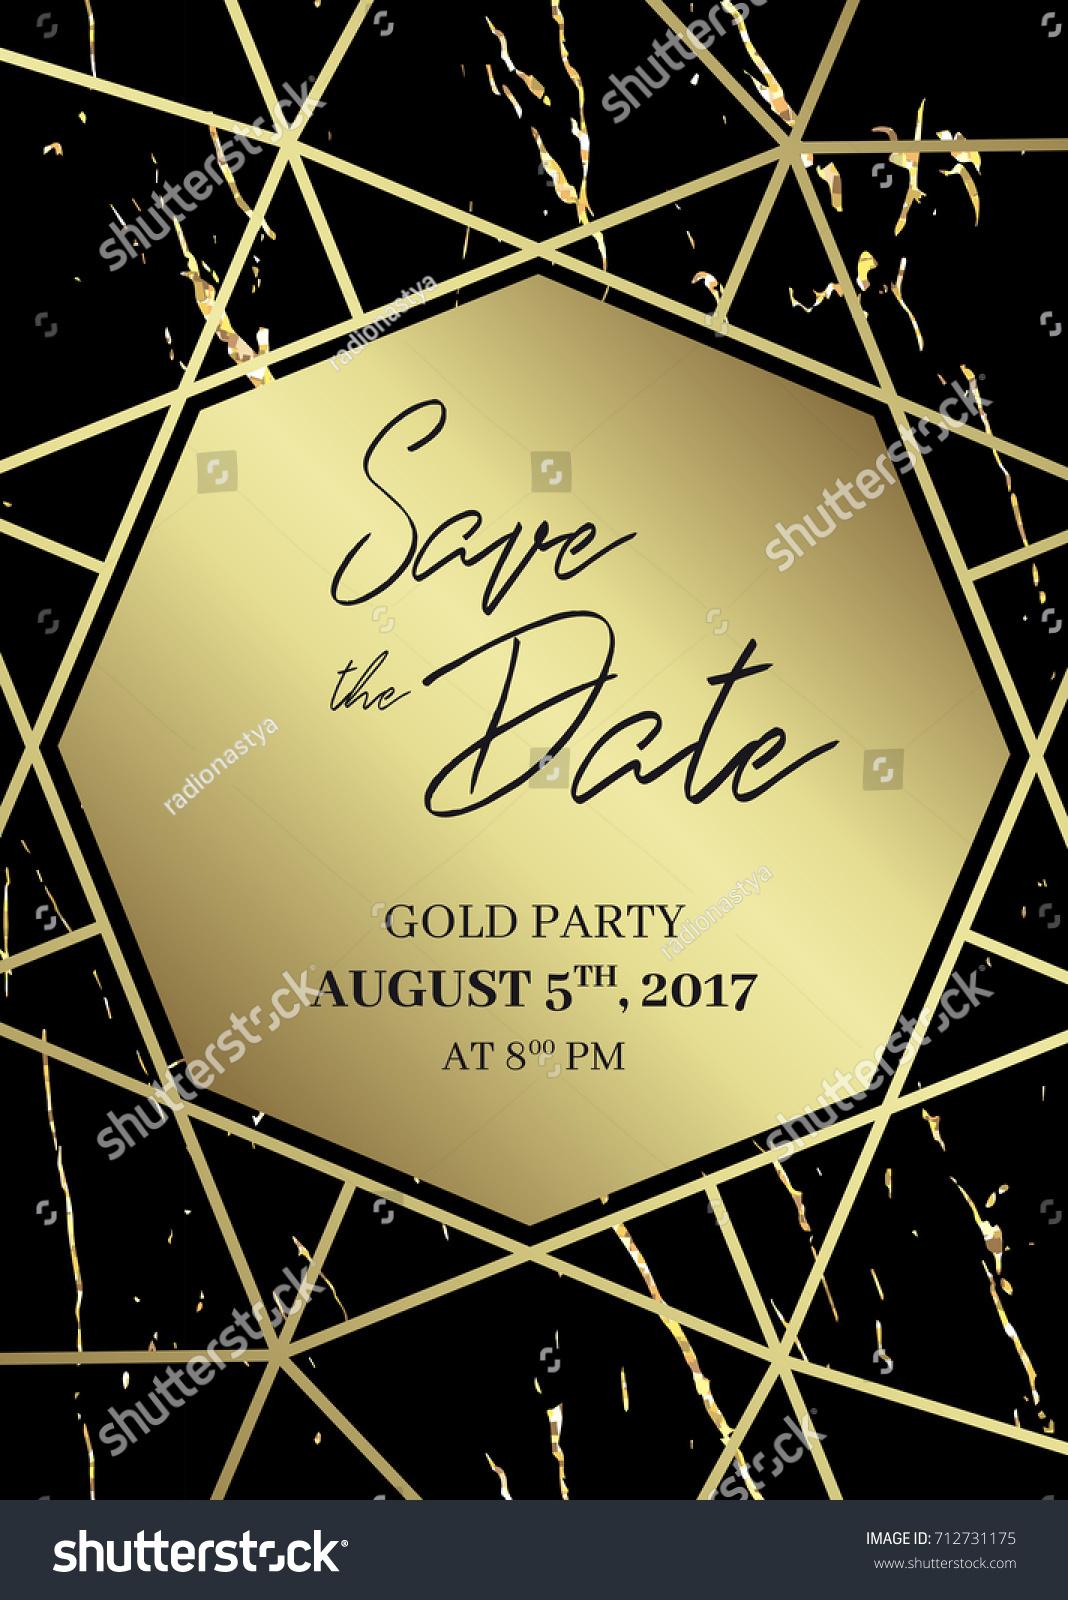 save date design template formal invite のベクター画像素材